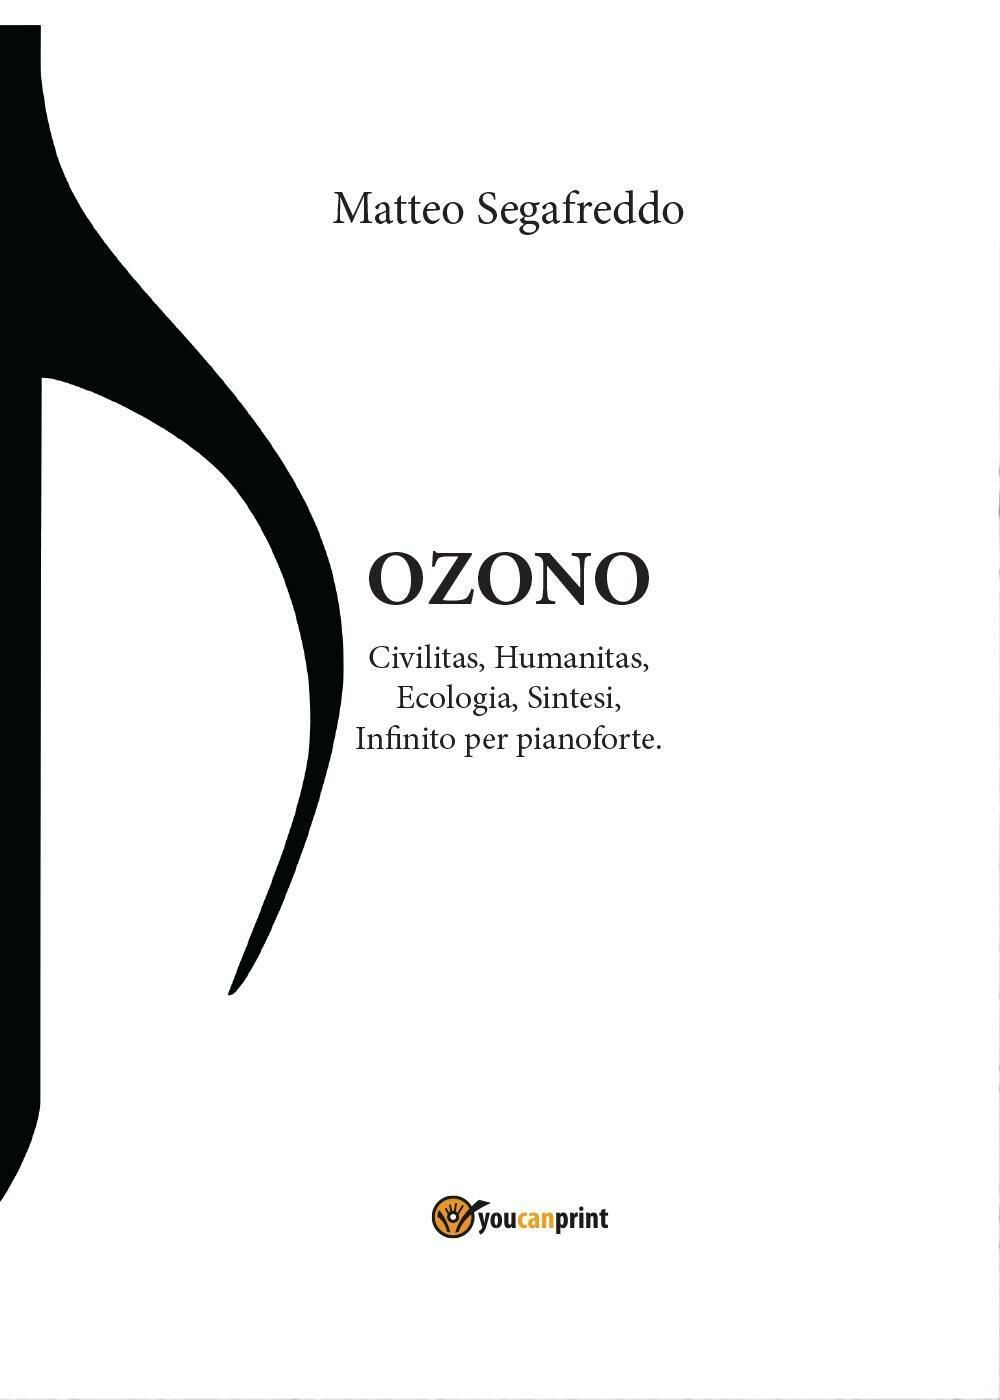 Ozono. Civilitas, humanitas, ecologia, sintesi, infinito per pianoforte